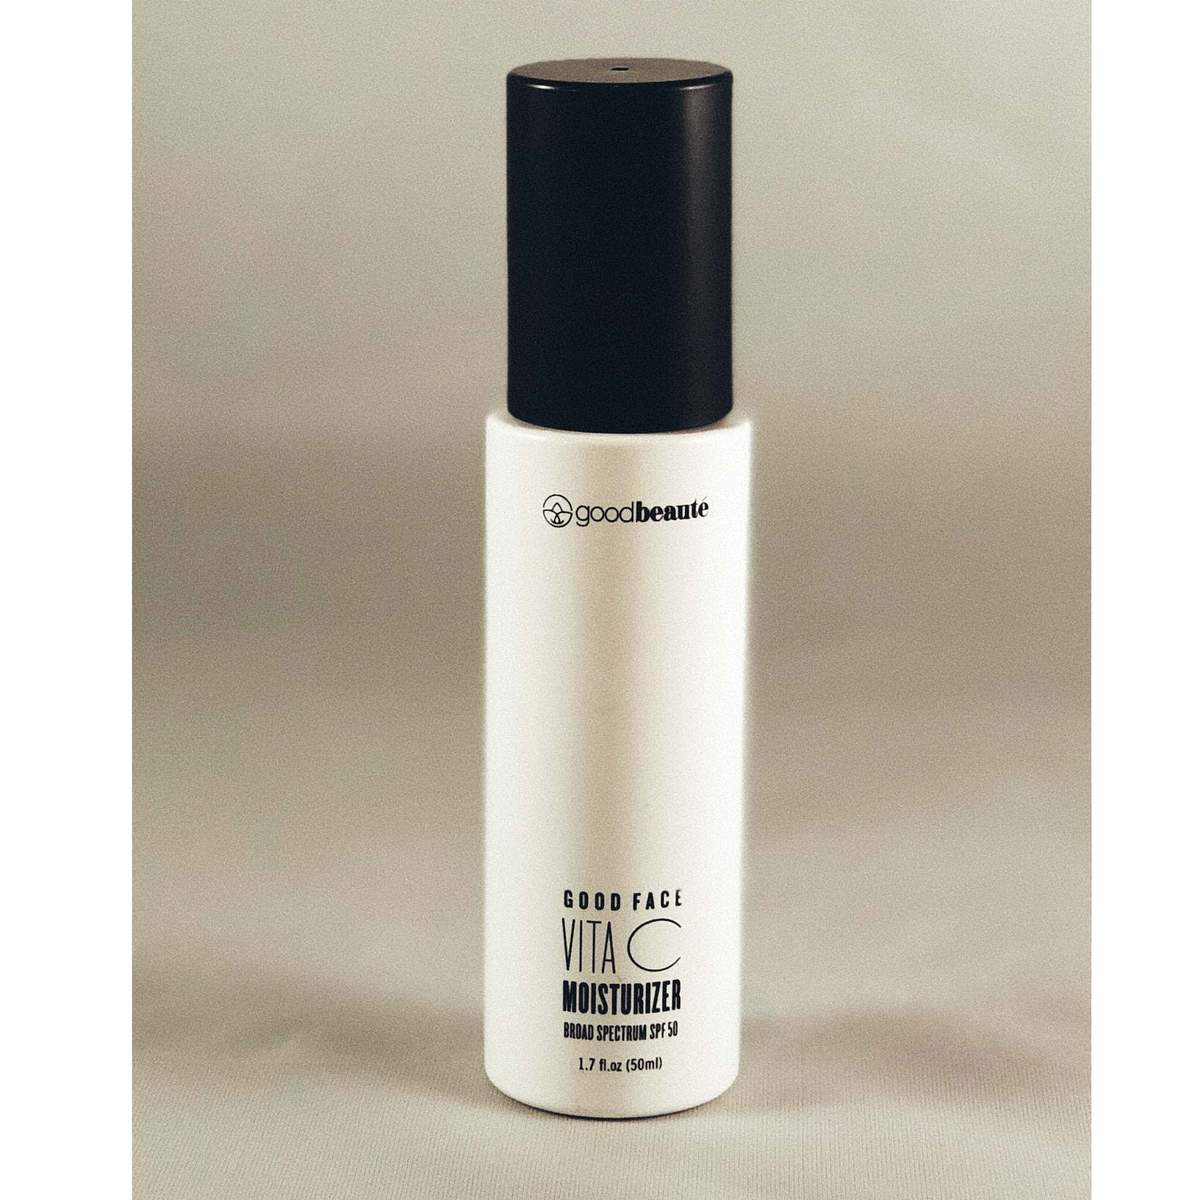 spf black people - best sunscreen for black skin